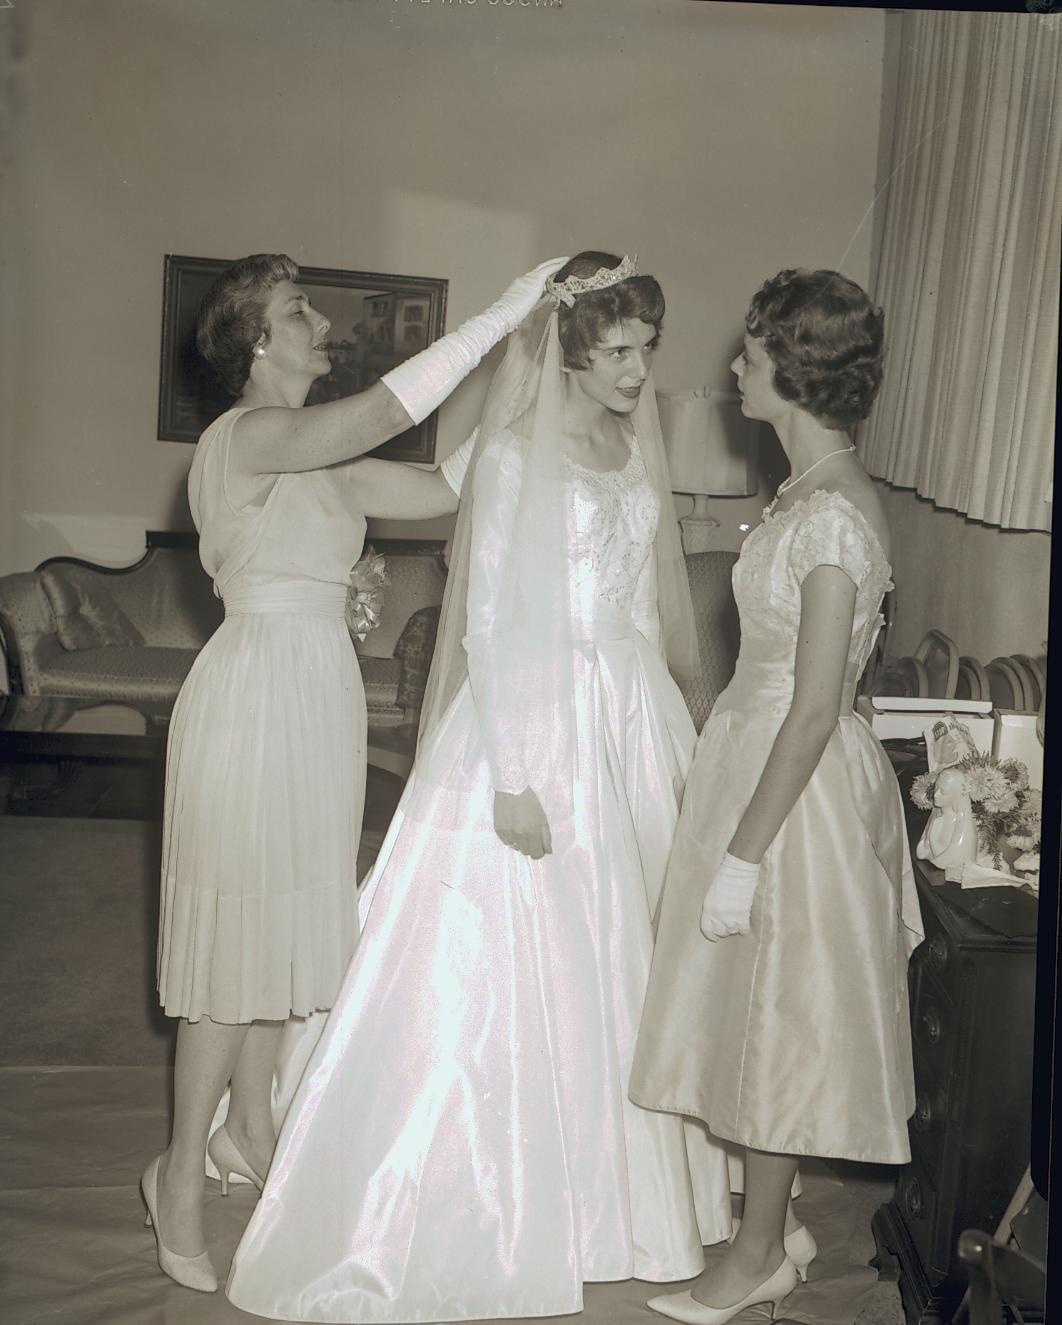 1960 wedding dresses  WagnerCarson Wedding   Weddings  Pinterest  Wedding